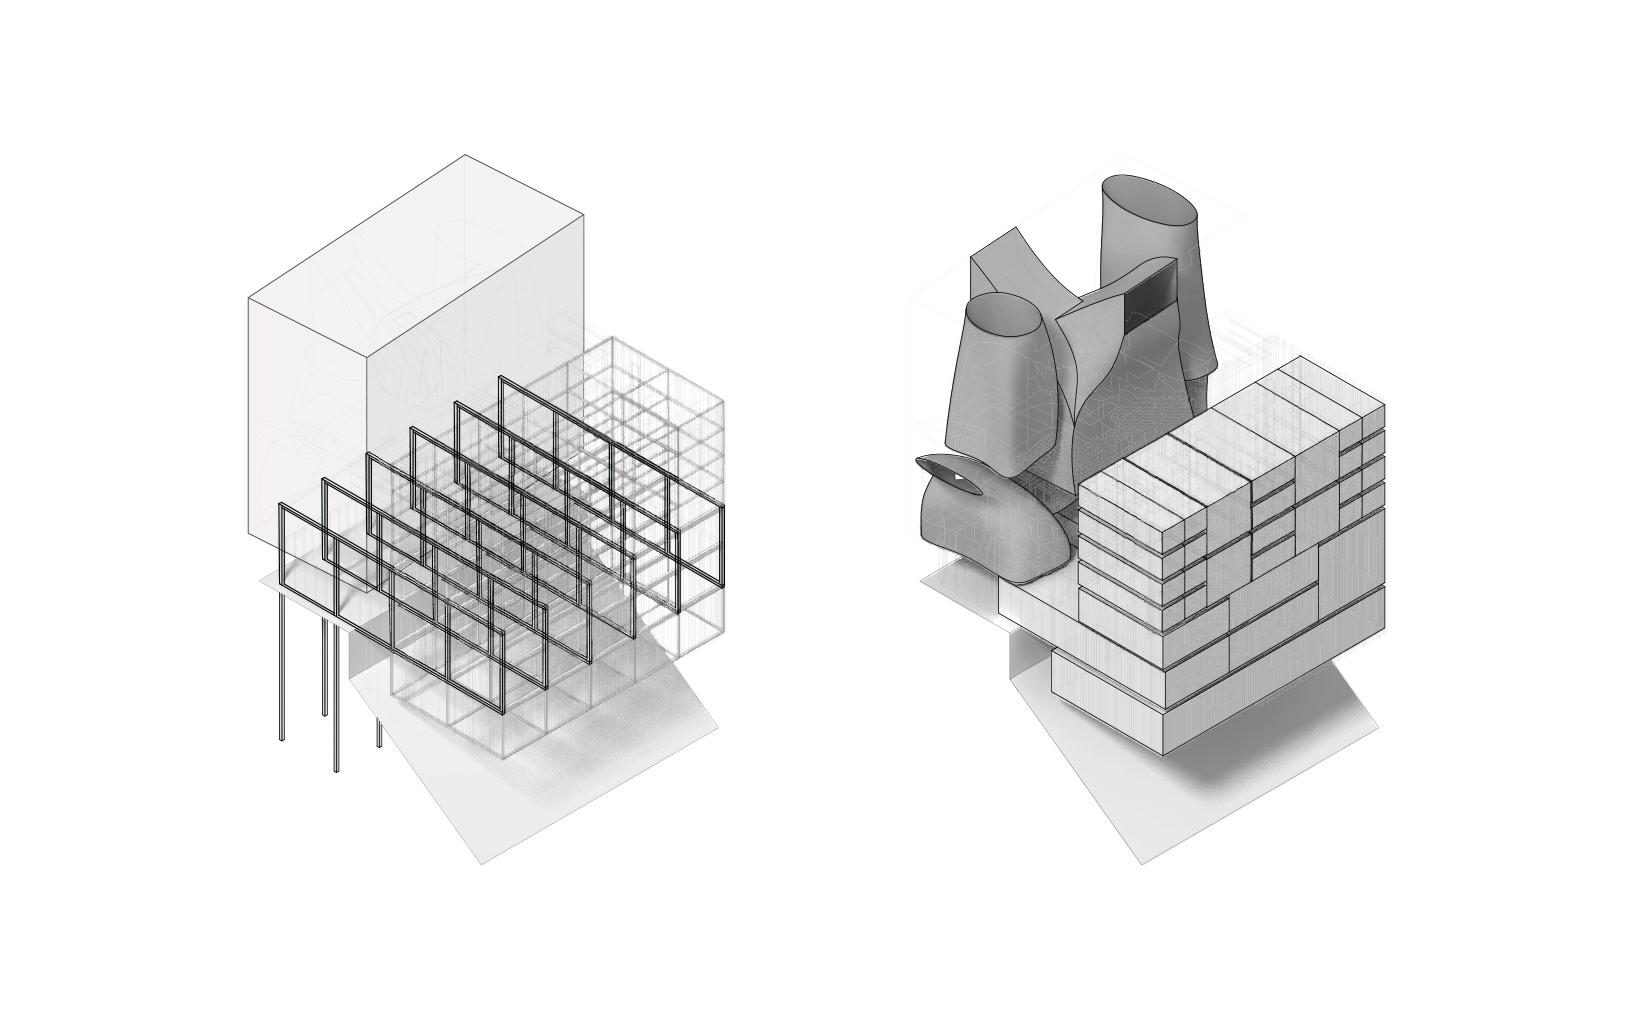 Structure & Program